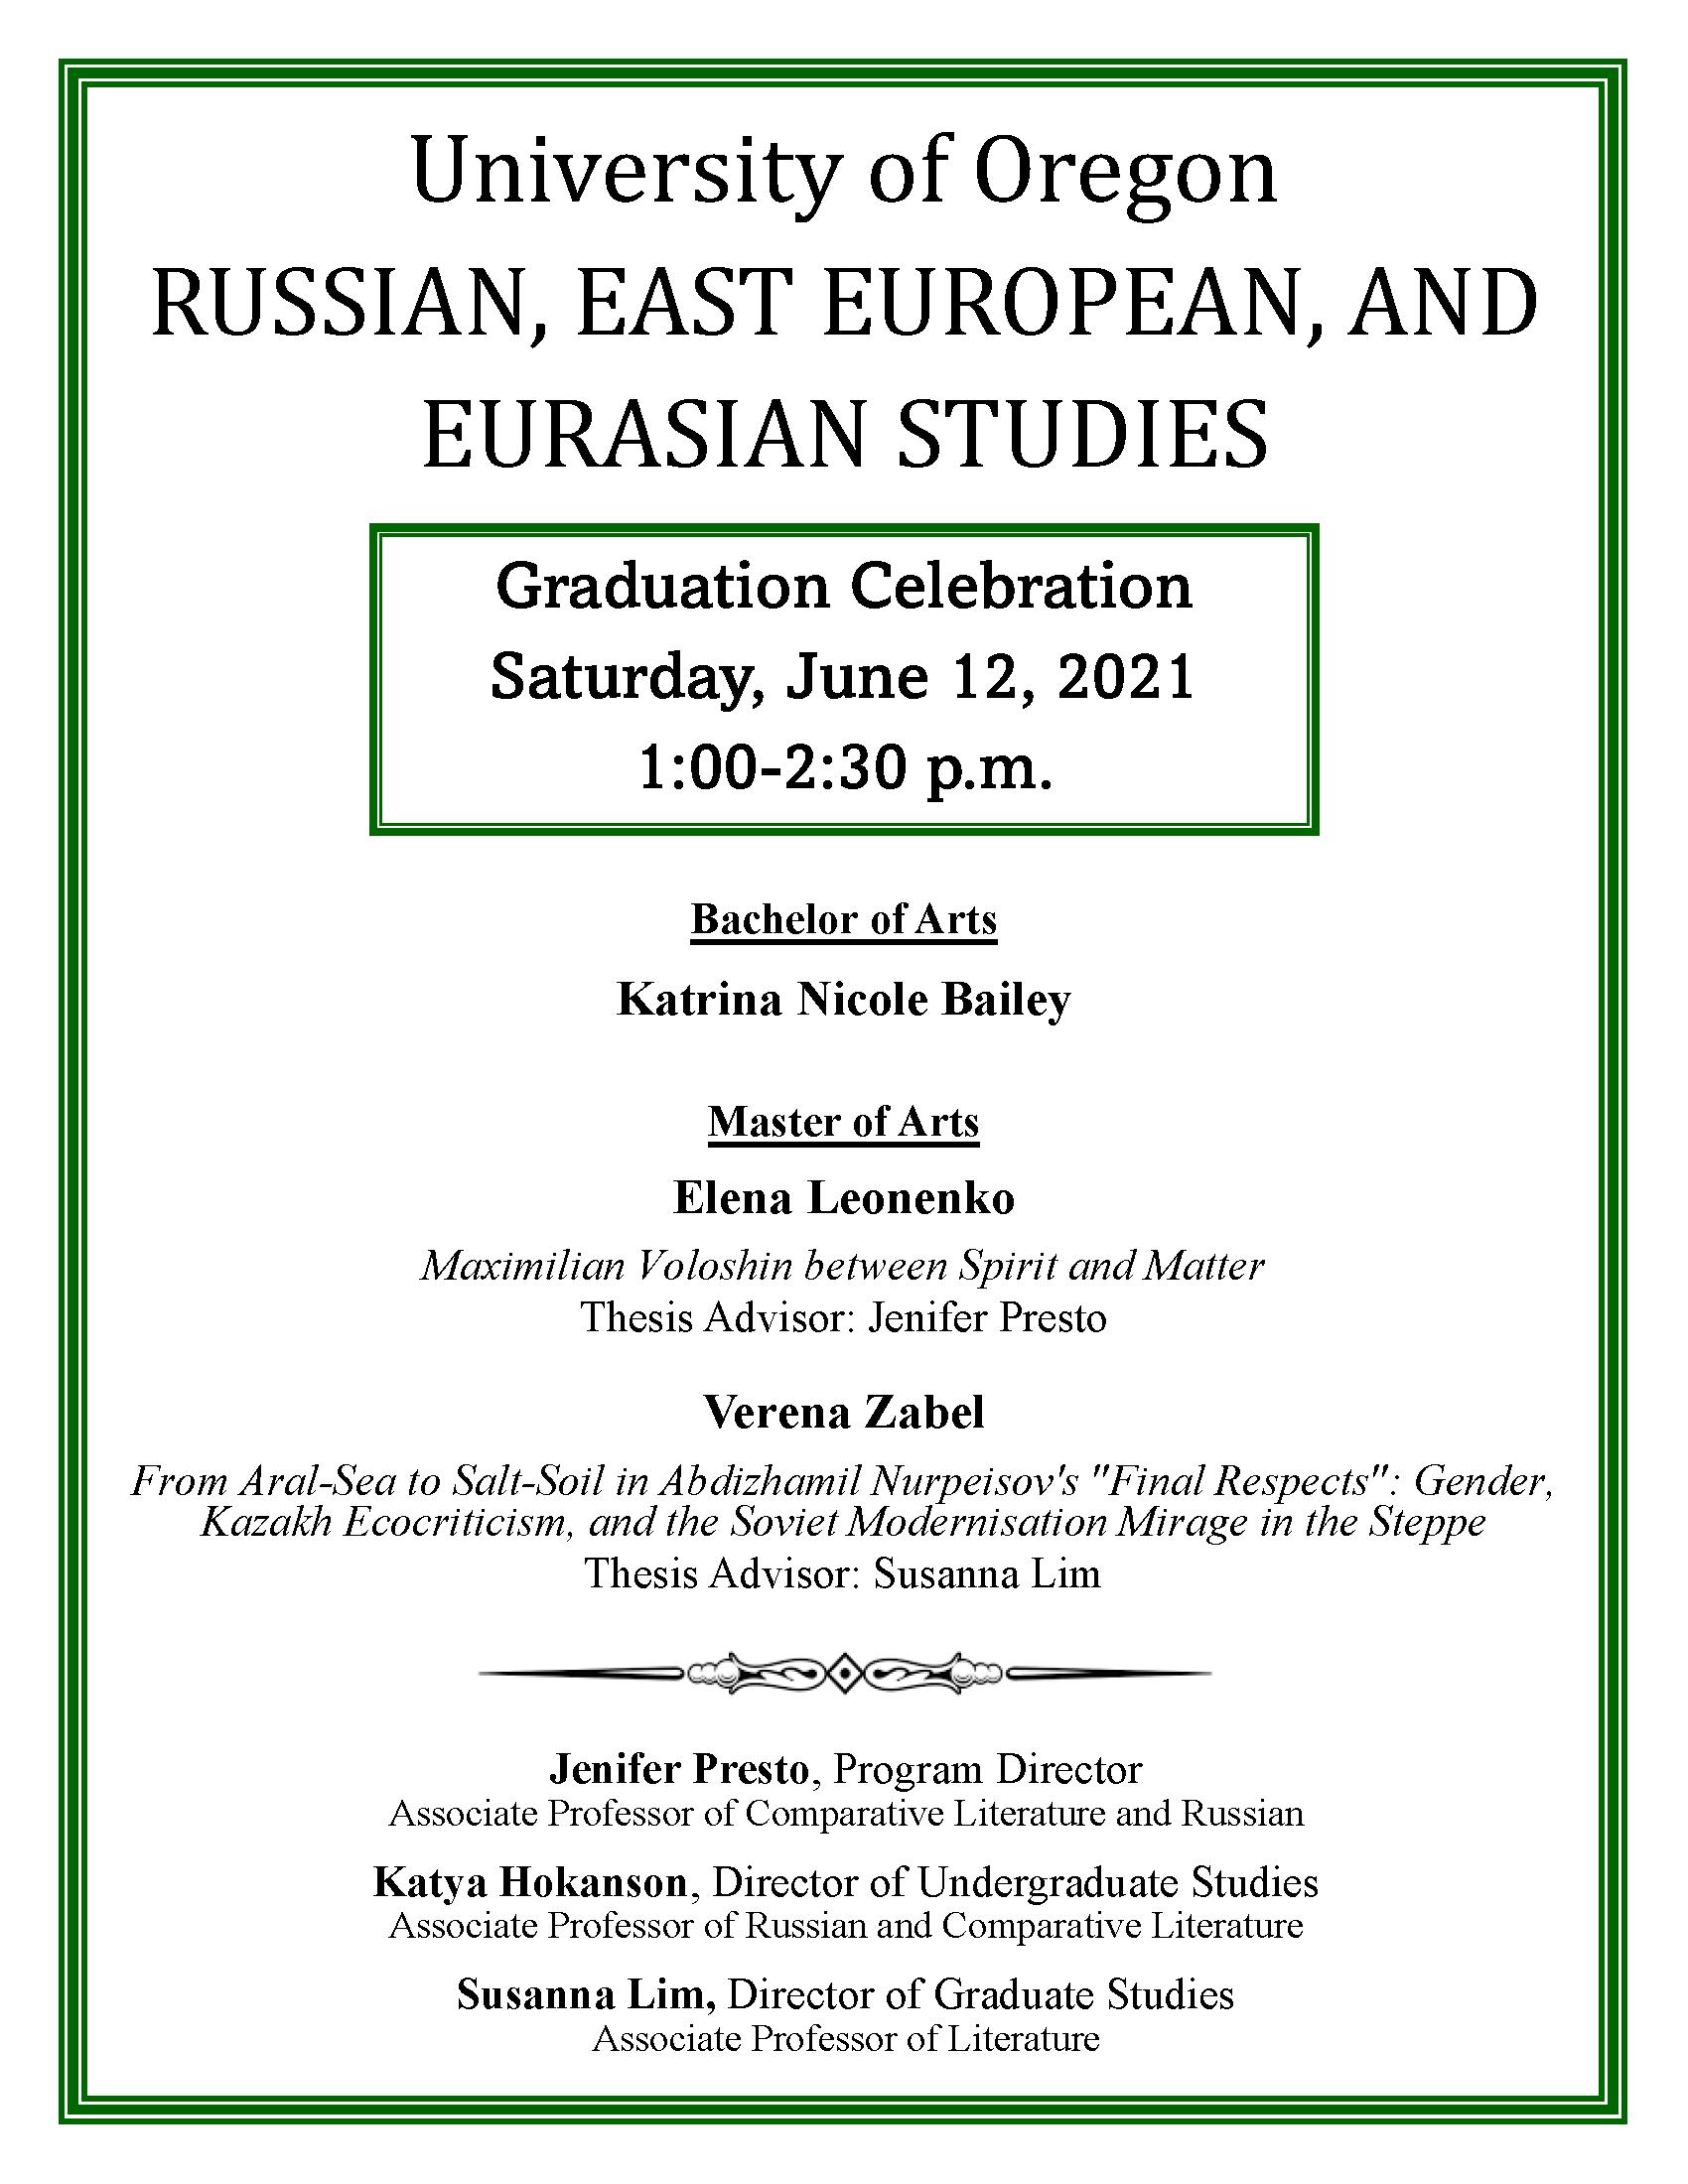 REEES Graduation Celebration Program